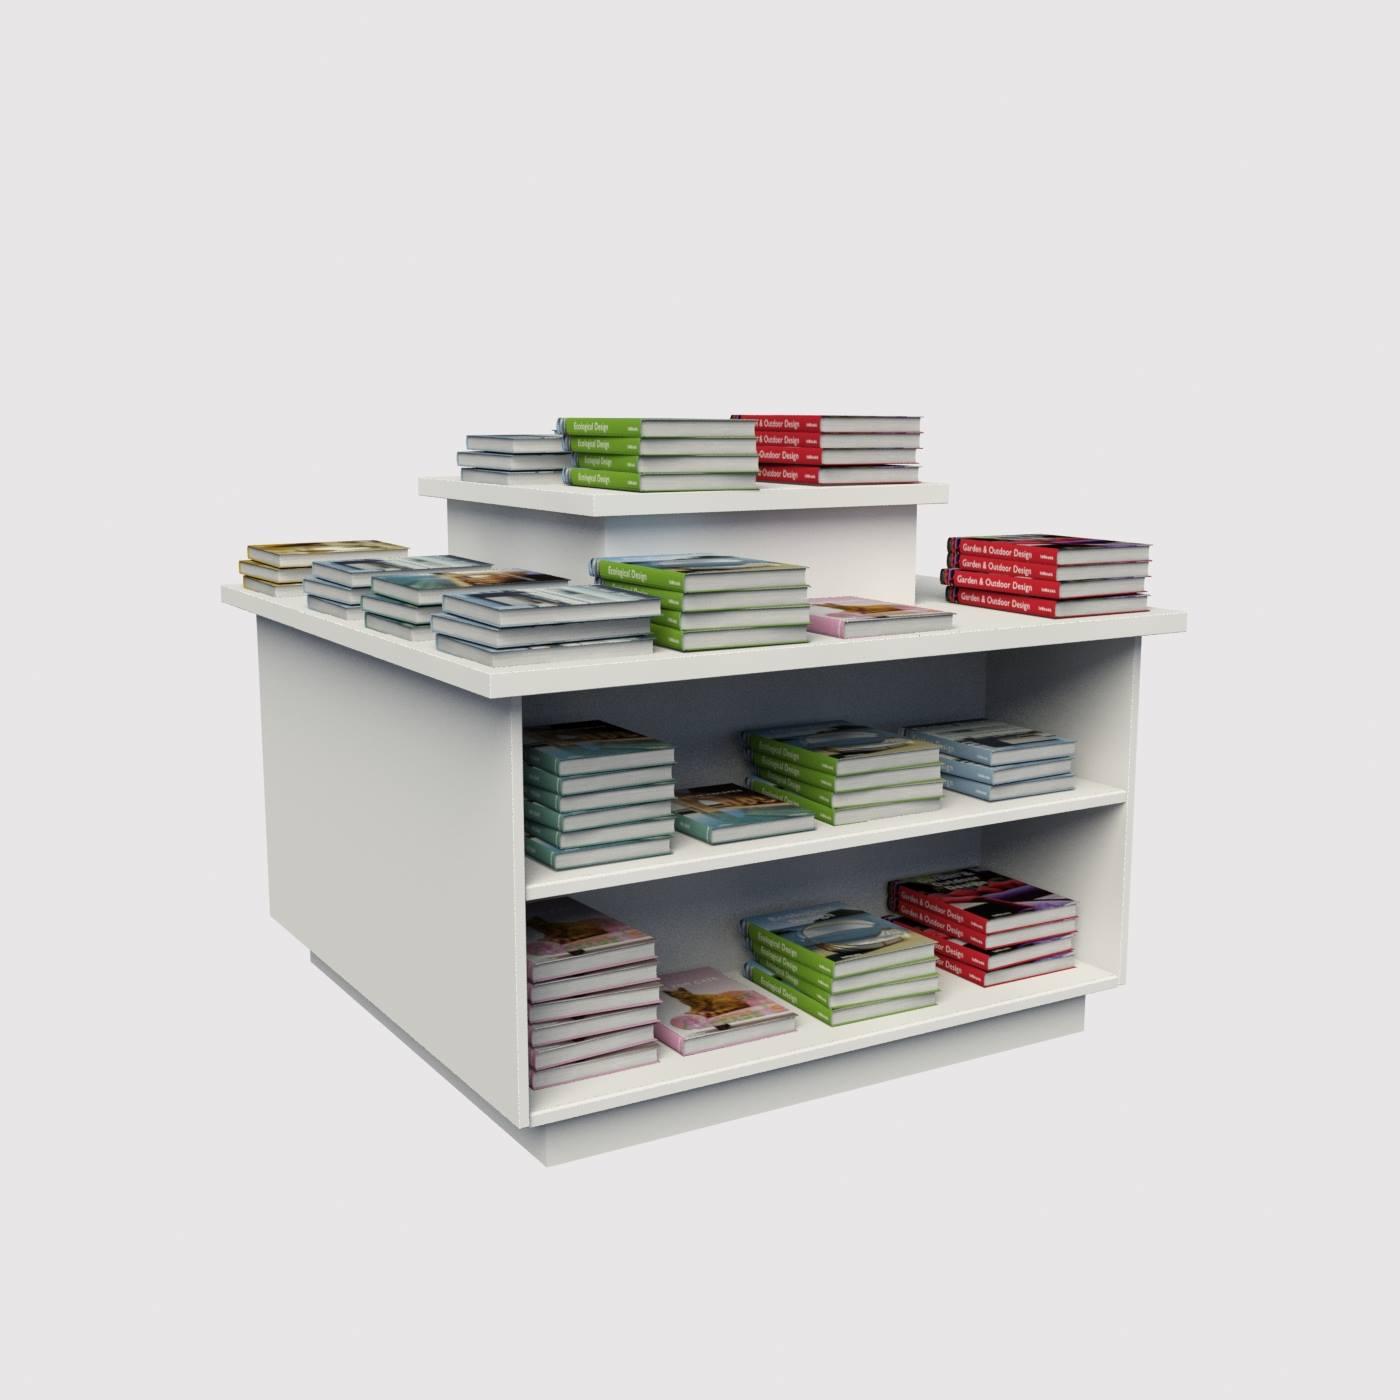 exoplismos vivliopoliou εξοπλισμός βιβλιοπωλείων διακόσμηση καταστημάτων ανακαίνιση βιβλιοπωλείου κατασκευή